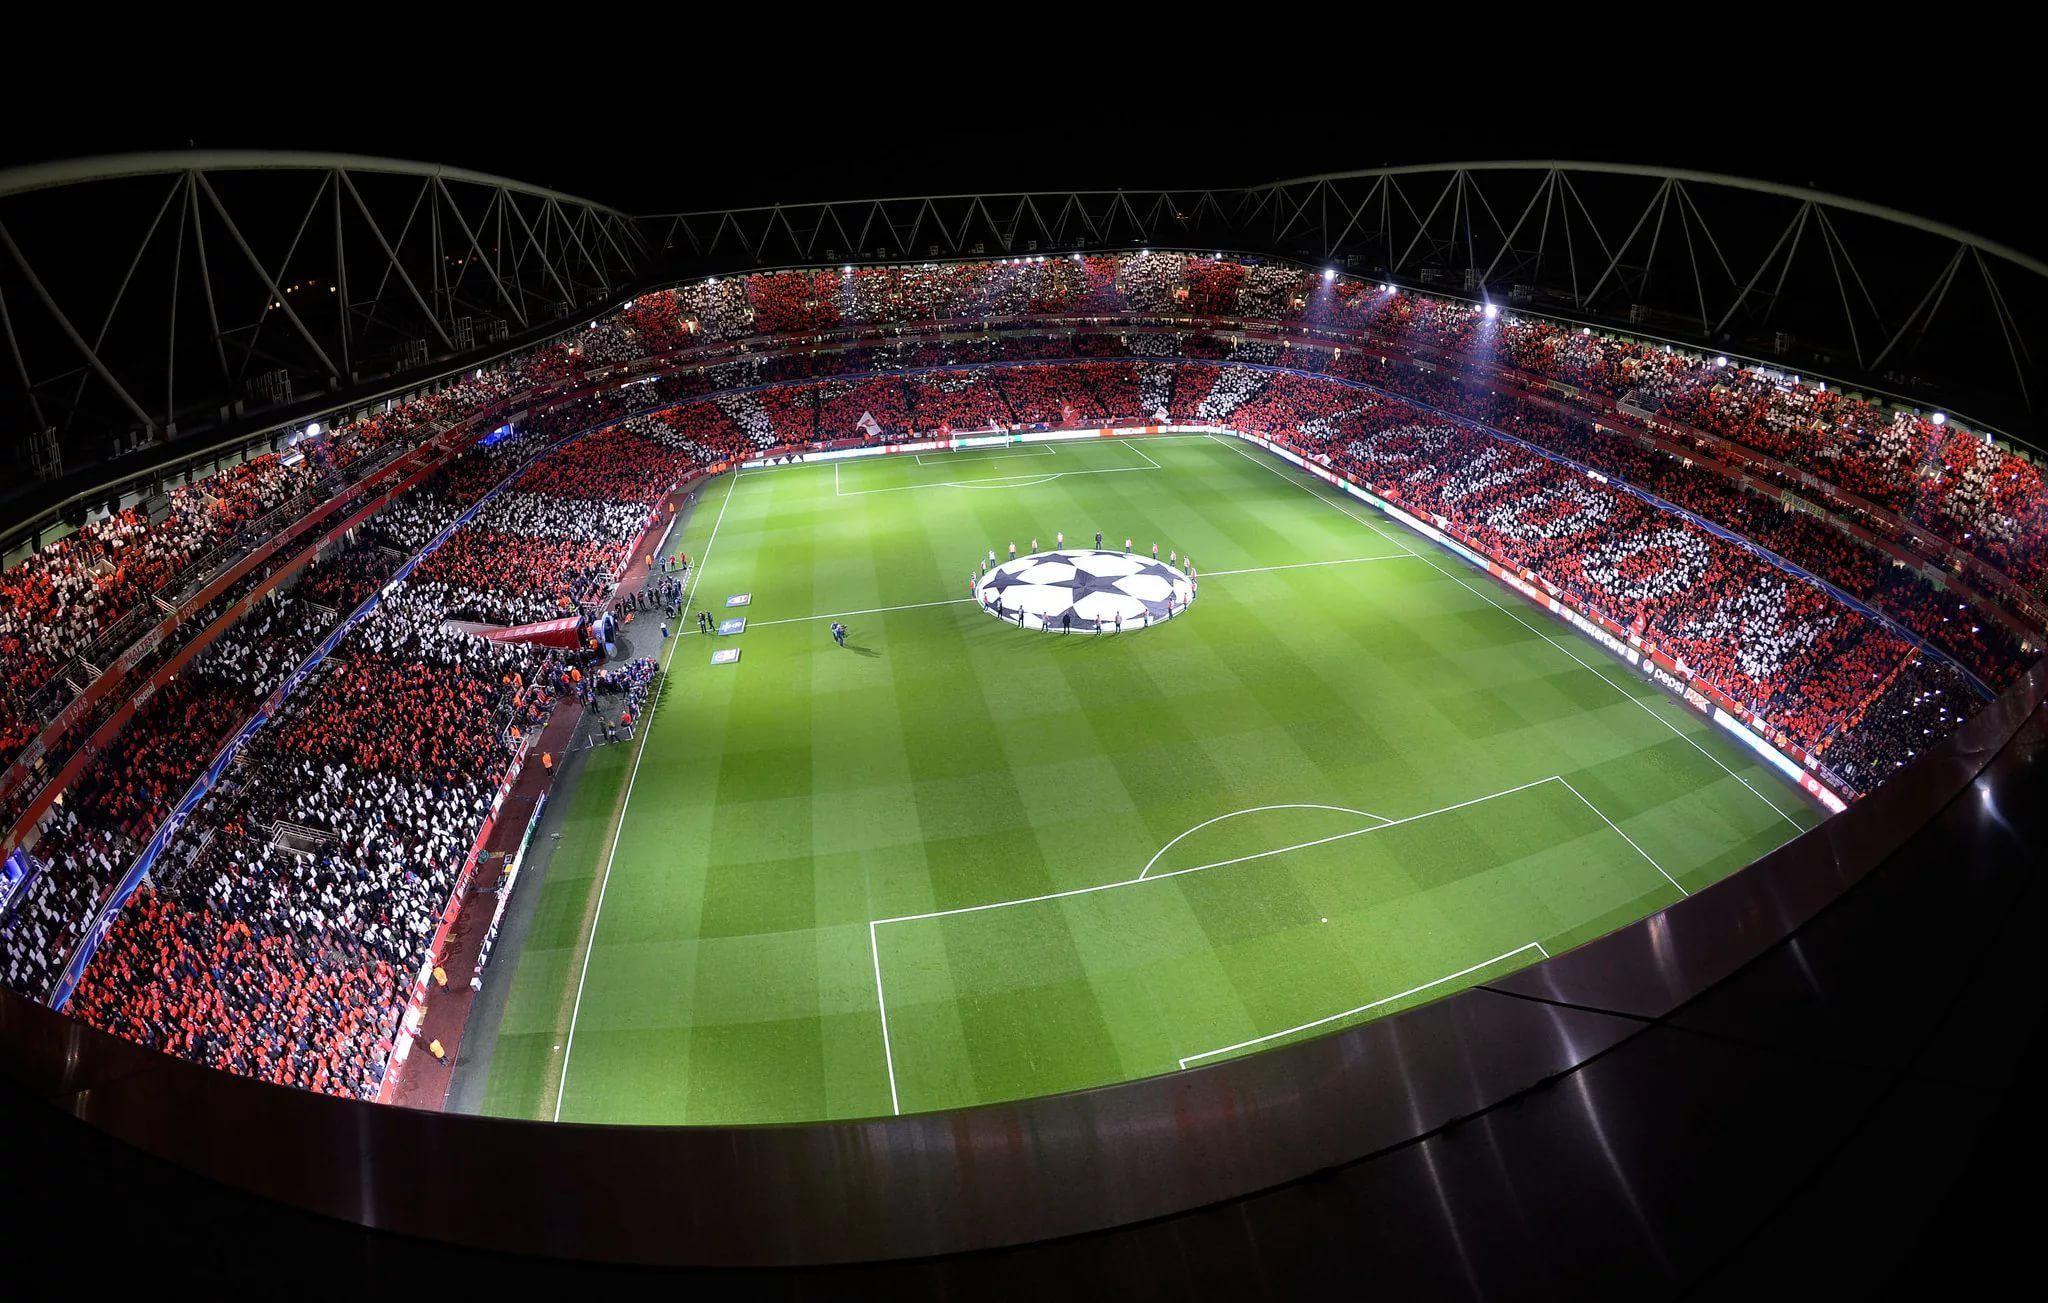 Emirates Stadium Wallpapers Top Free Emirates Stadium Backgrounds Wallpaperaccess